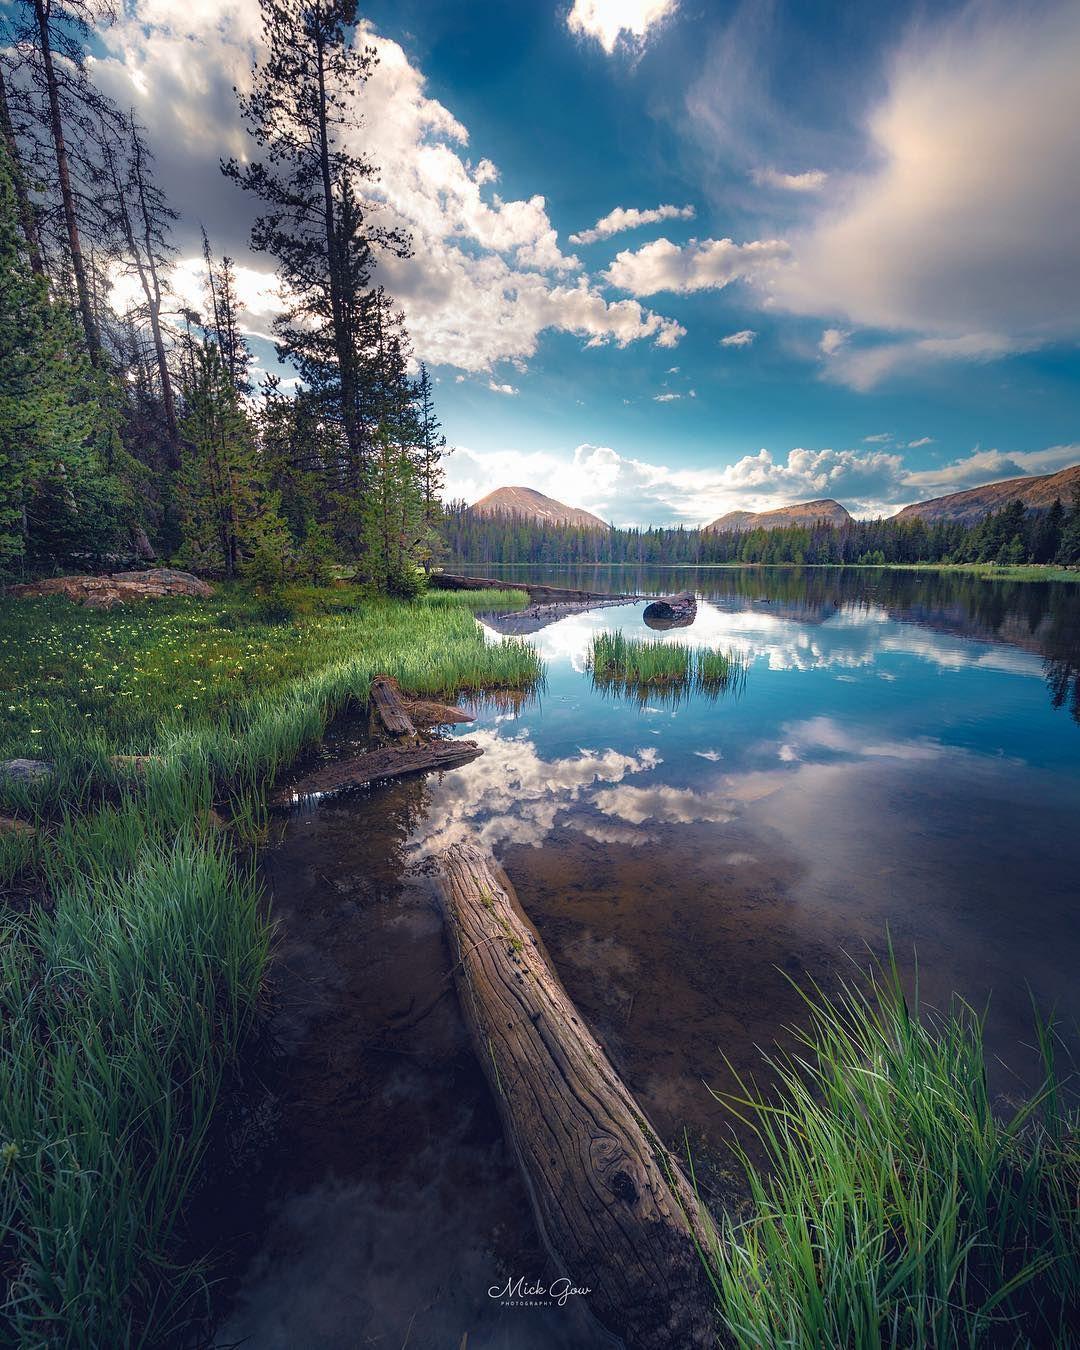 Awesome Earthpix Beautiful Landscape Photography By Mick Gow Landscape Photography Beautiful Landscape Photography Landscape